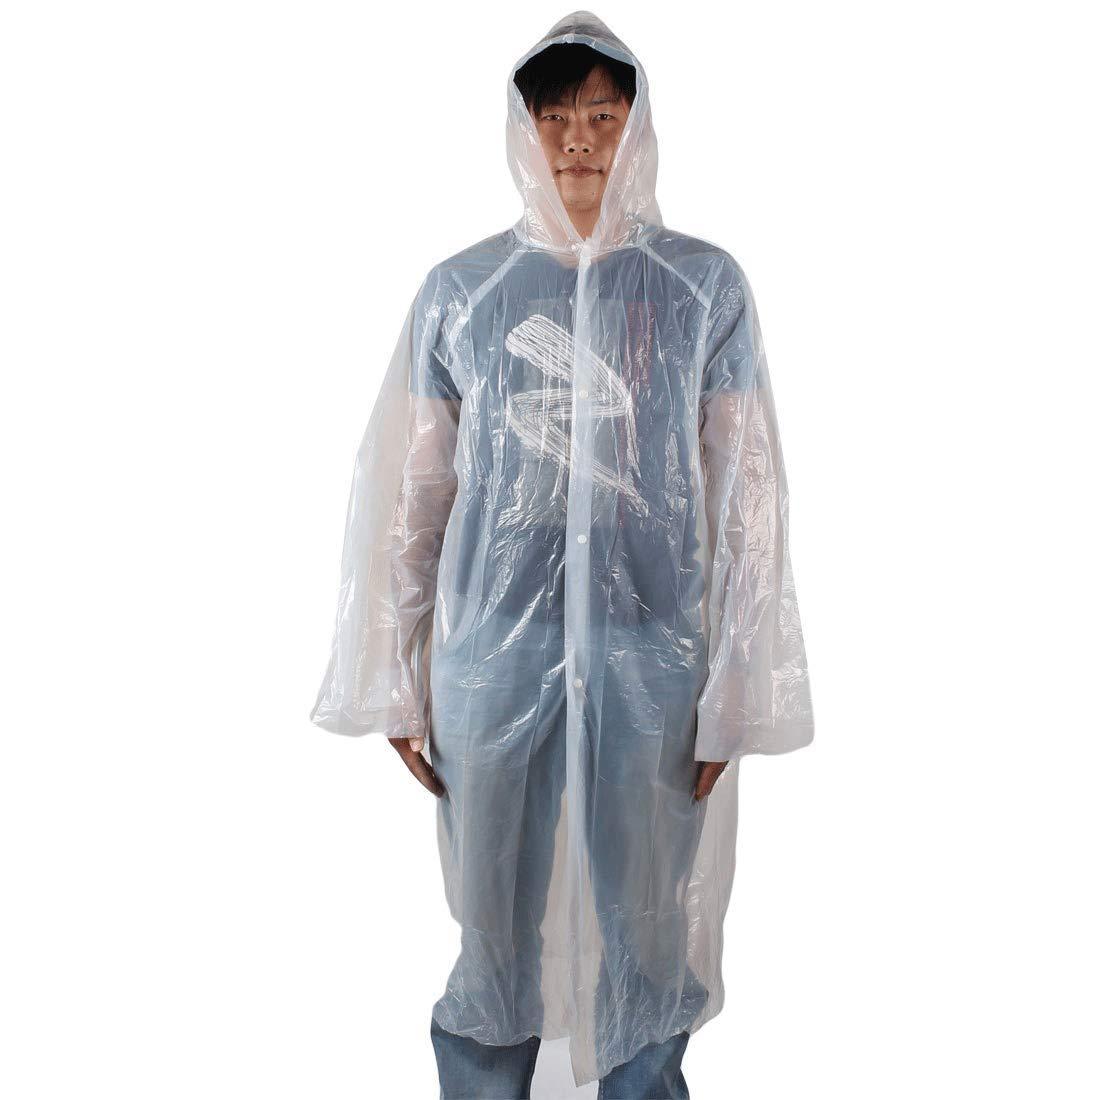 festpak Outdoor Travel Raincoat/Plastic Disposable Rain Poncho/Rainproof Cover